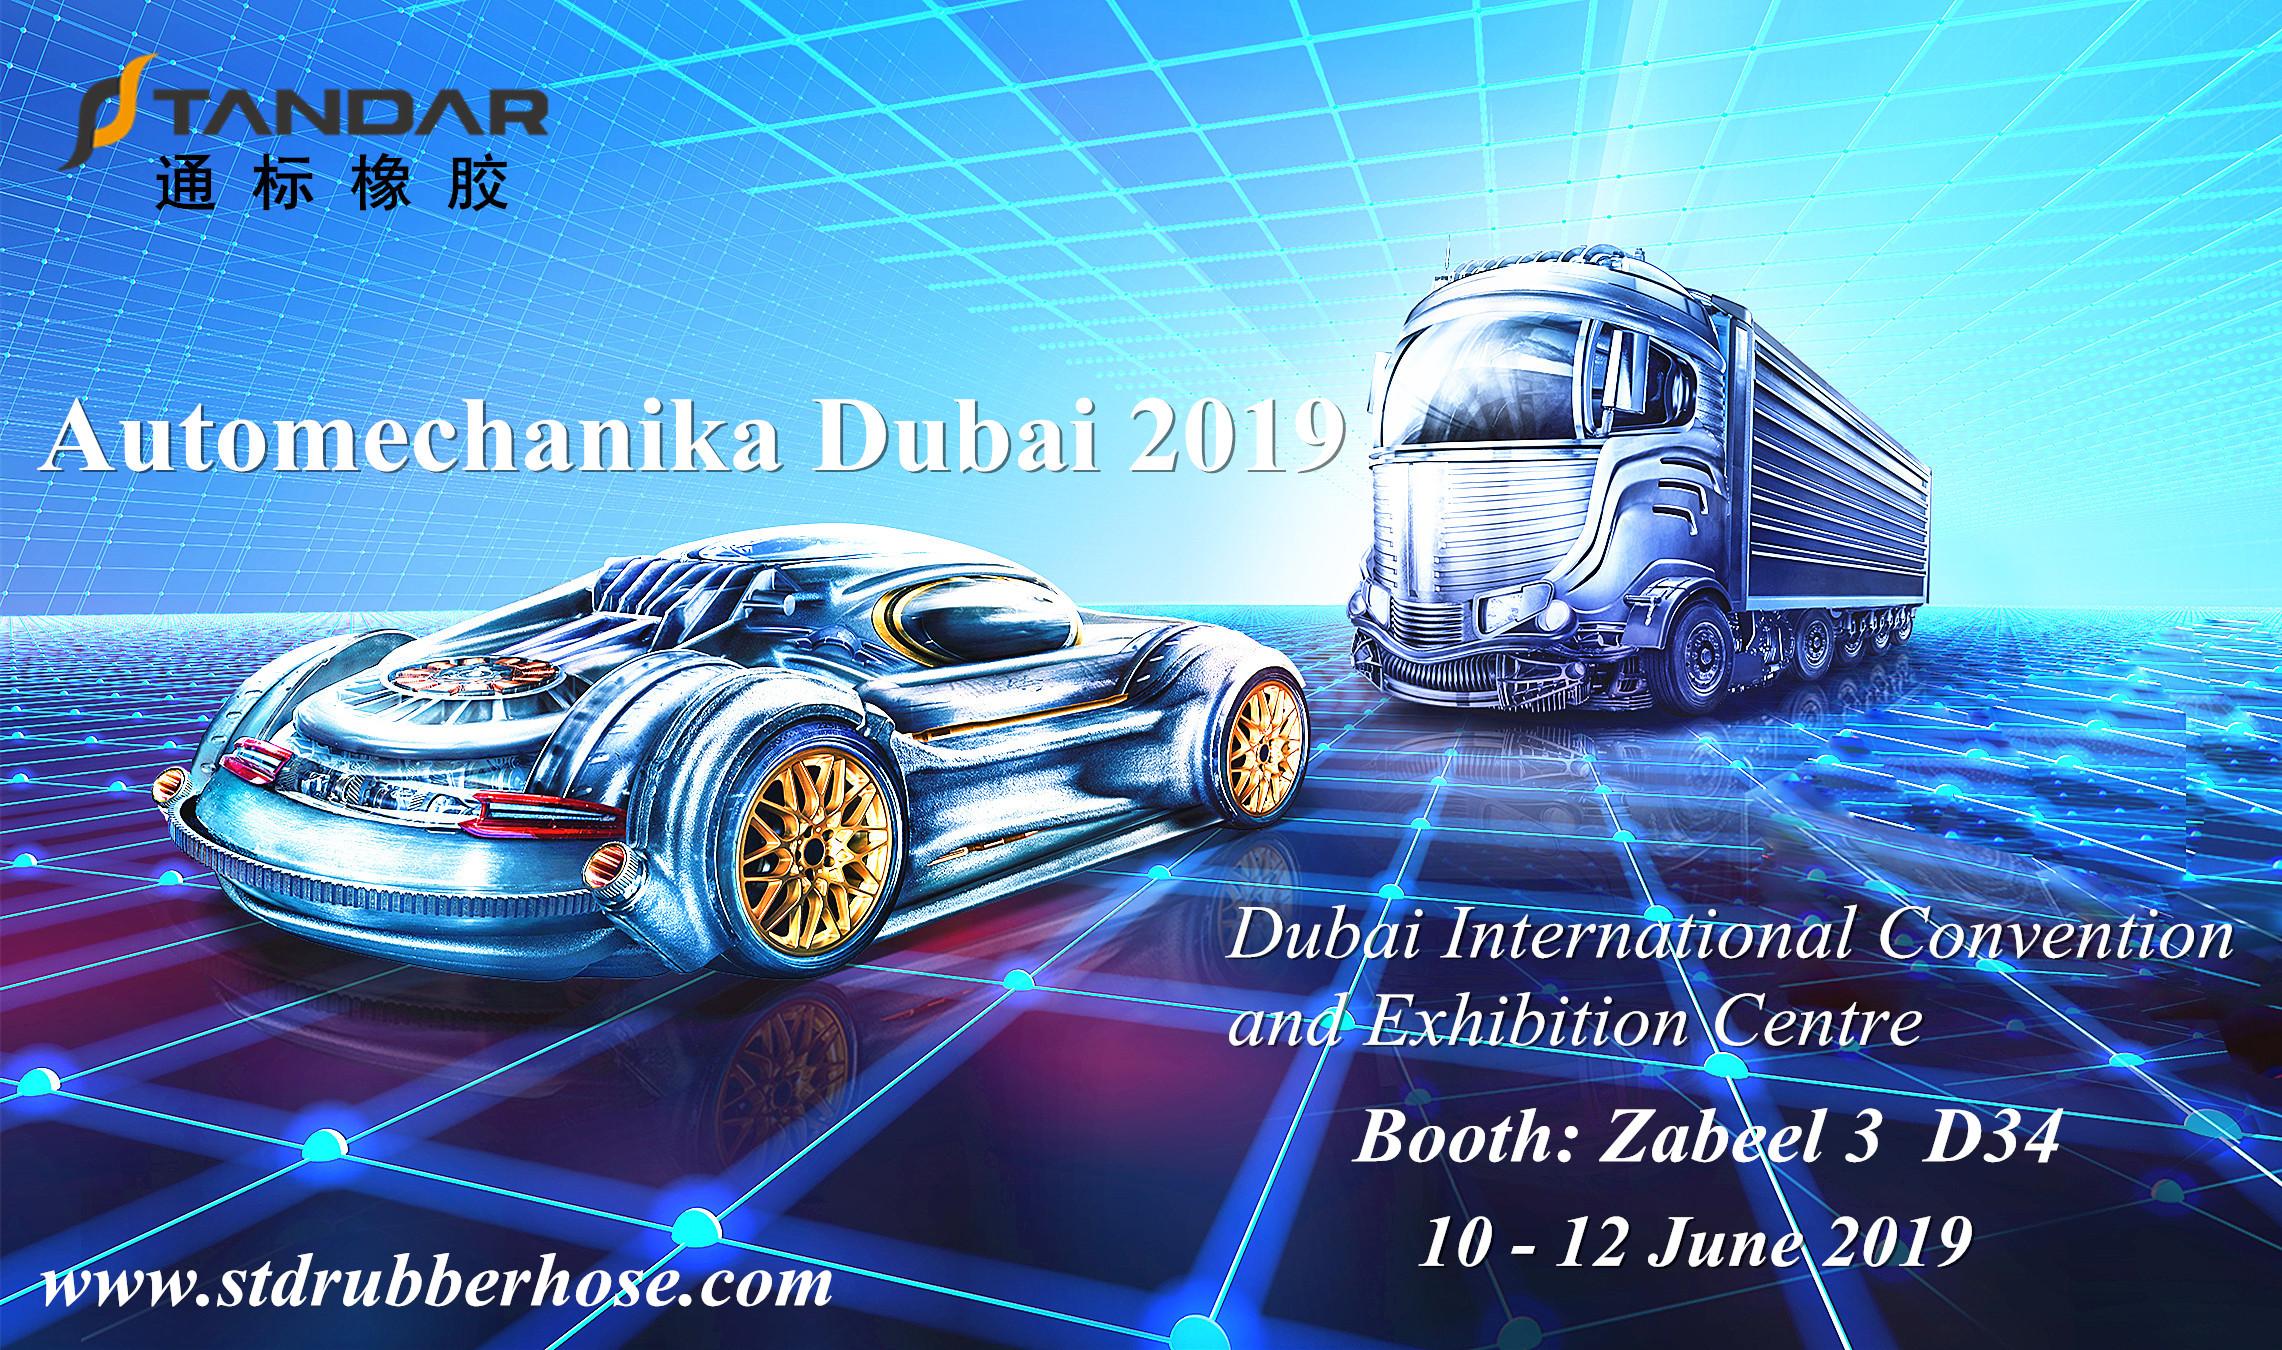 Invitation To Exhibition Booth : Automechanika dubai exhibition invitation shijiazhuang standards